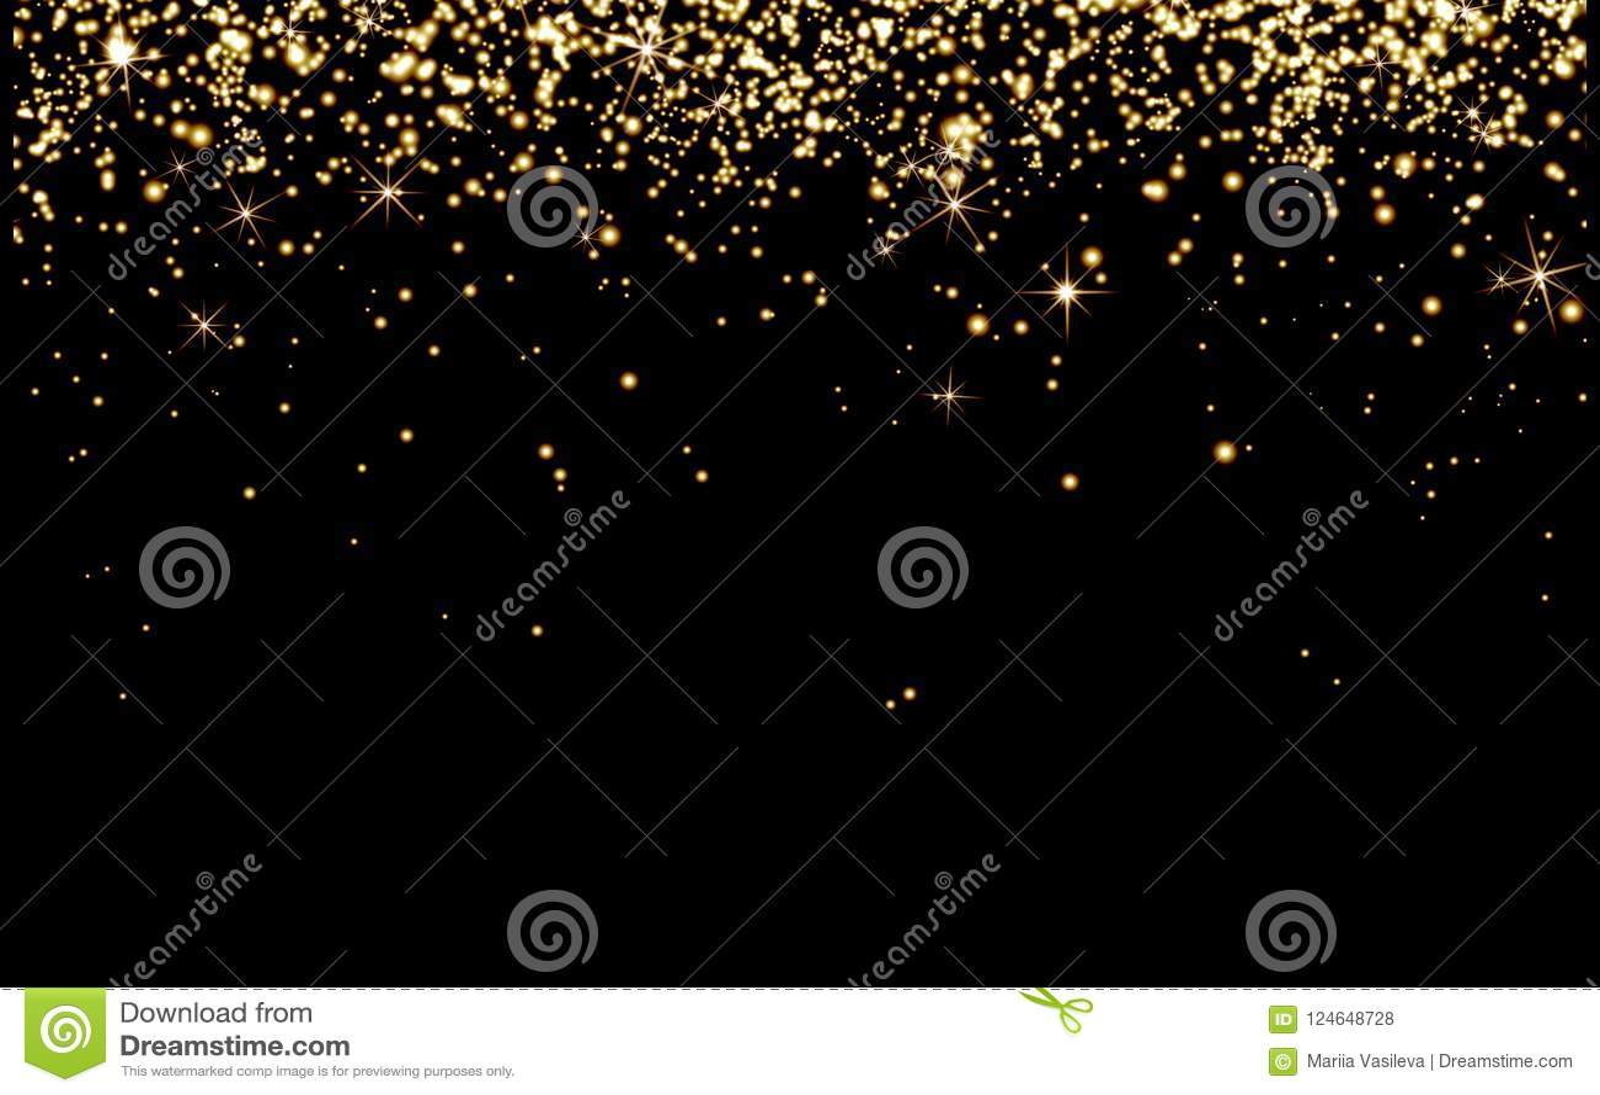 Tappa guld- champagnegnistor, ljusa gula partiklar skiner på bla